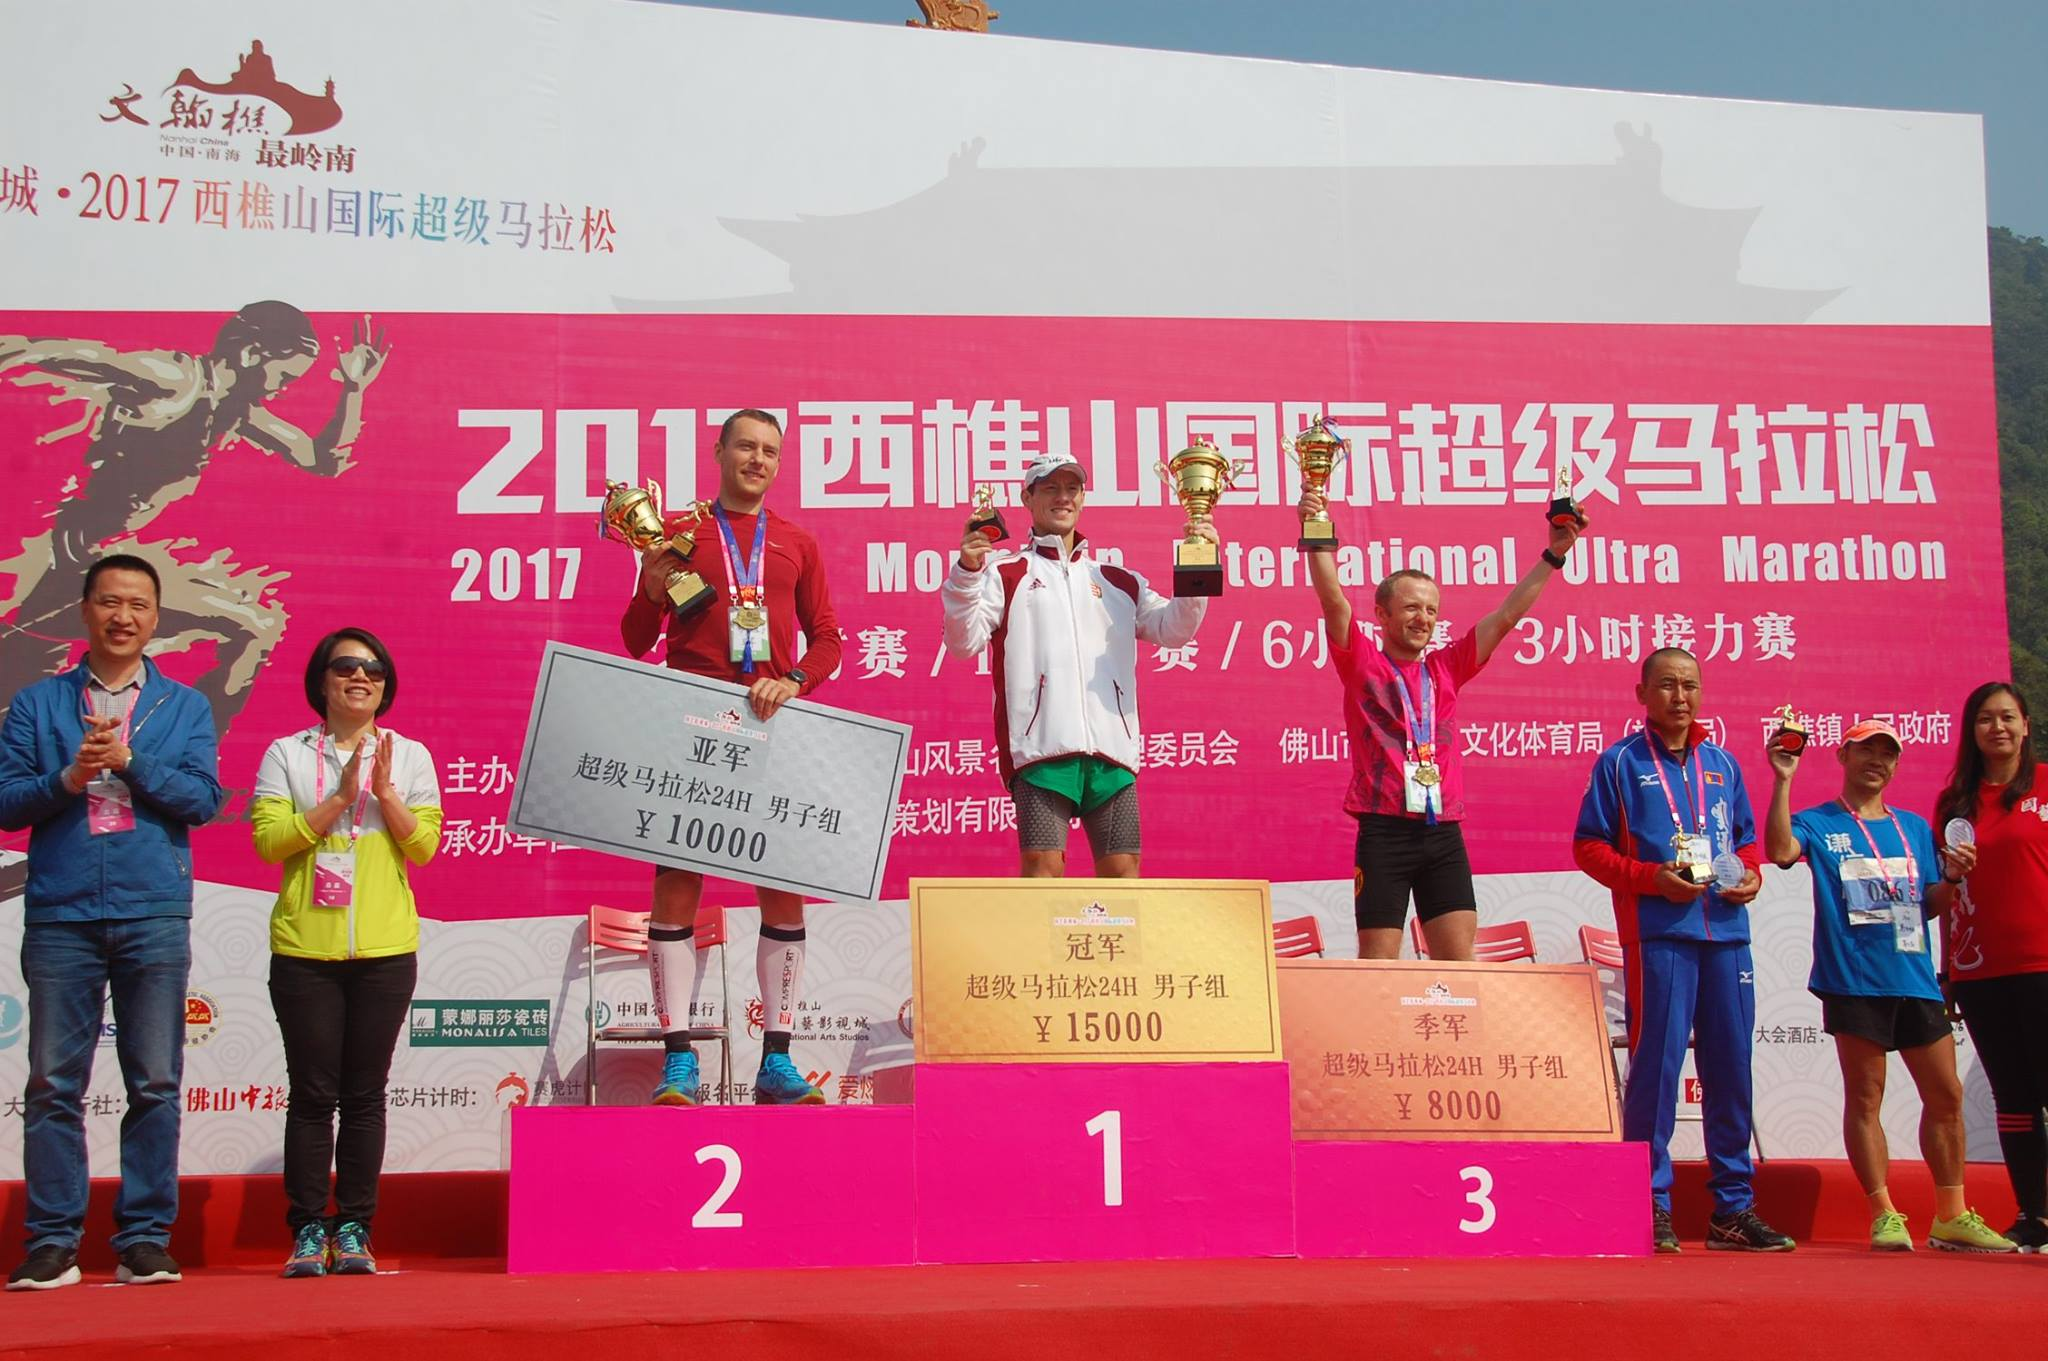 Fot. Archiwum Łukasza. Xiqiao Mountain International 24hr Ultra Marathon, Chiny 2017.